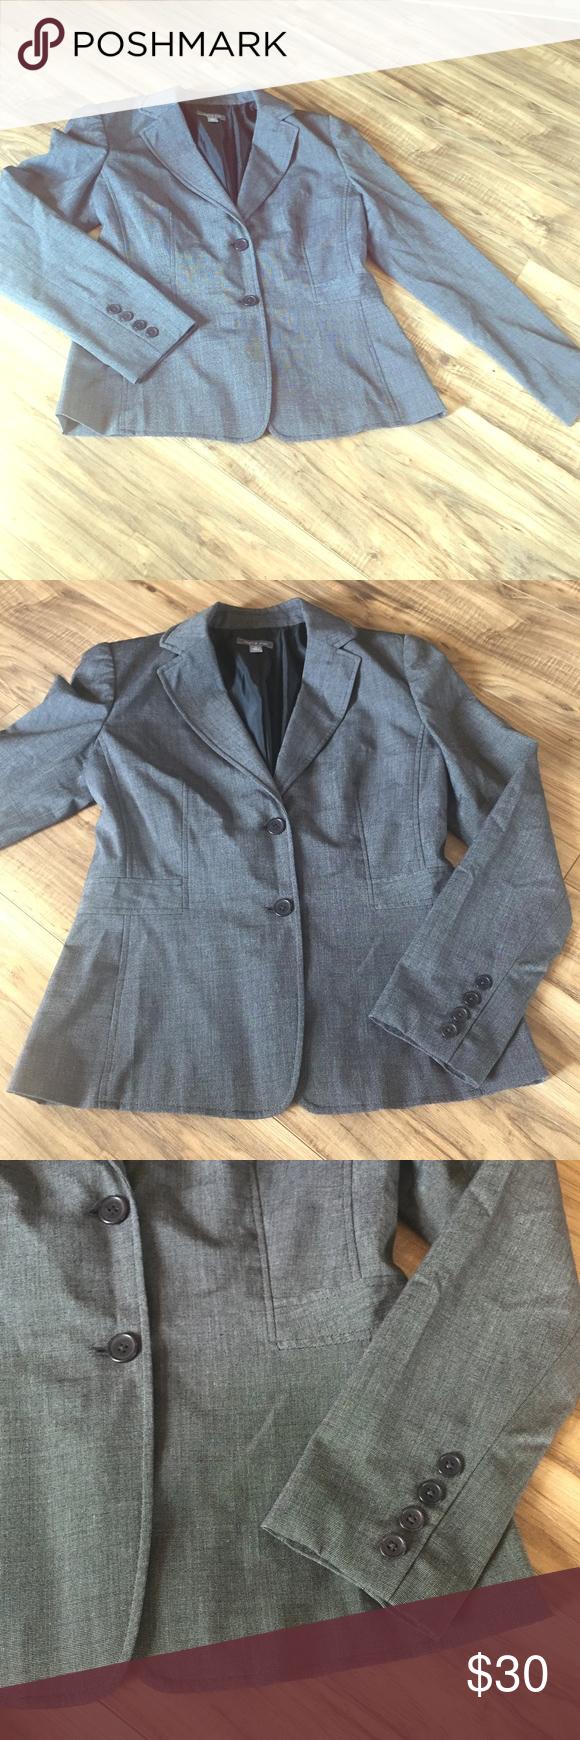 Apt. 9 Gray Stretch Blazer | Coats, Shape and Gray